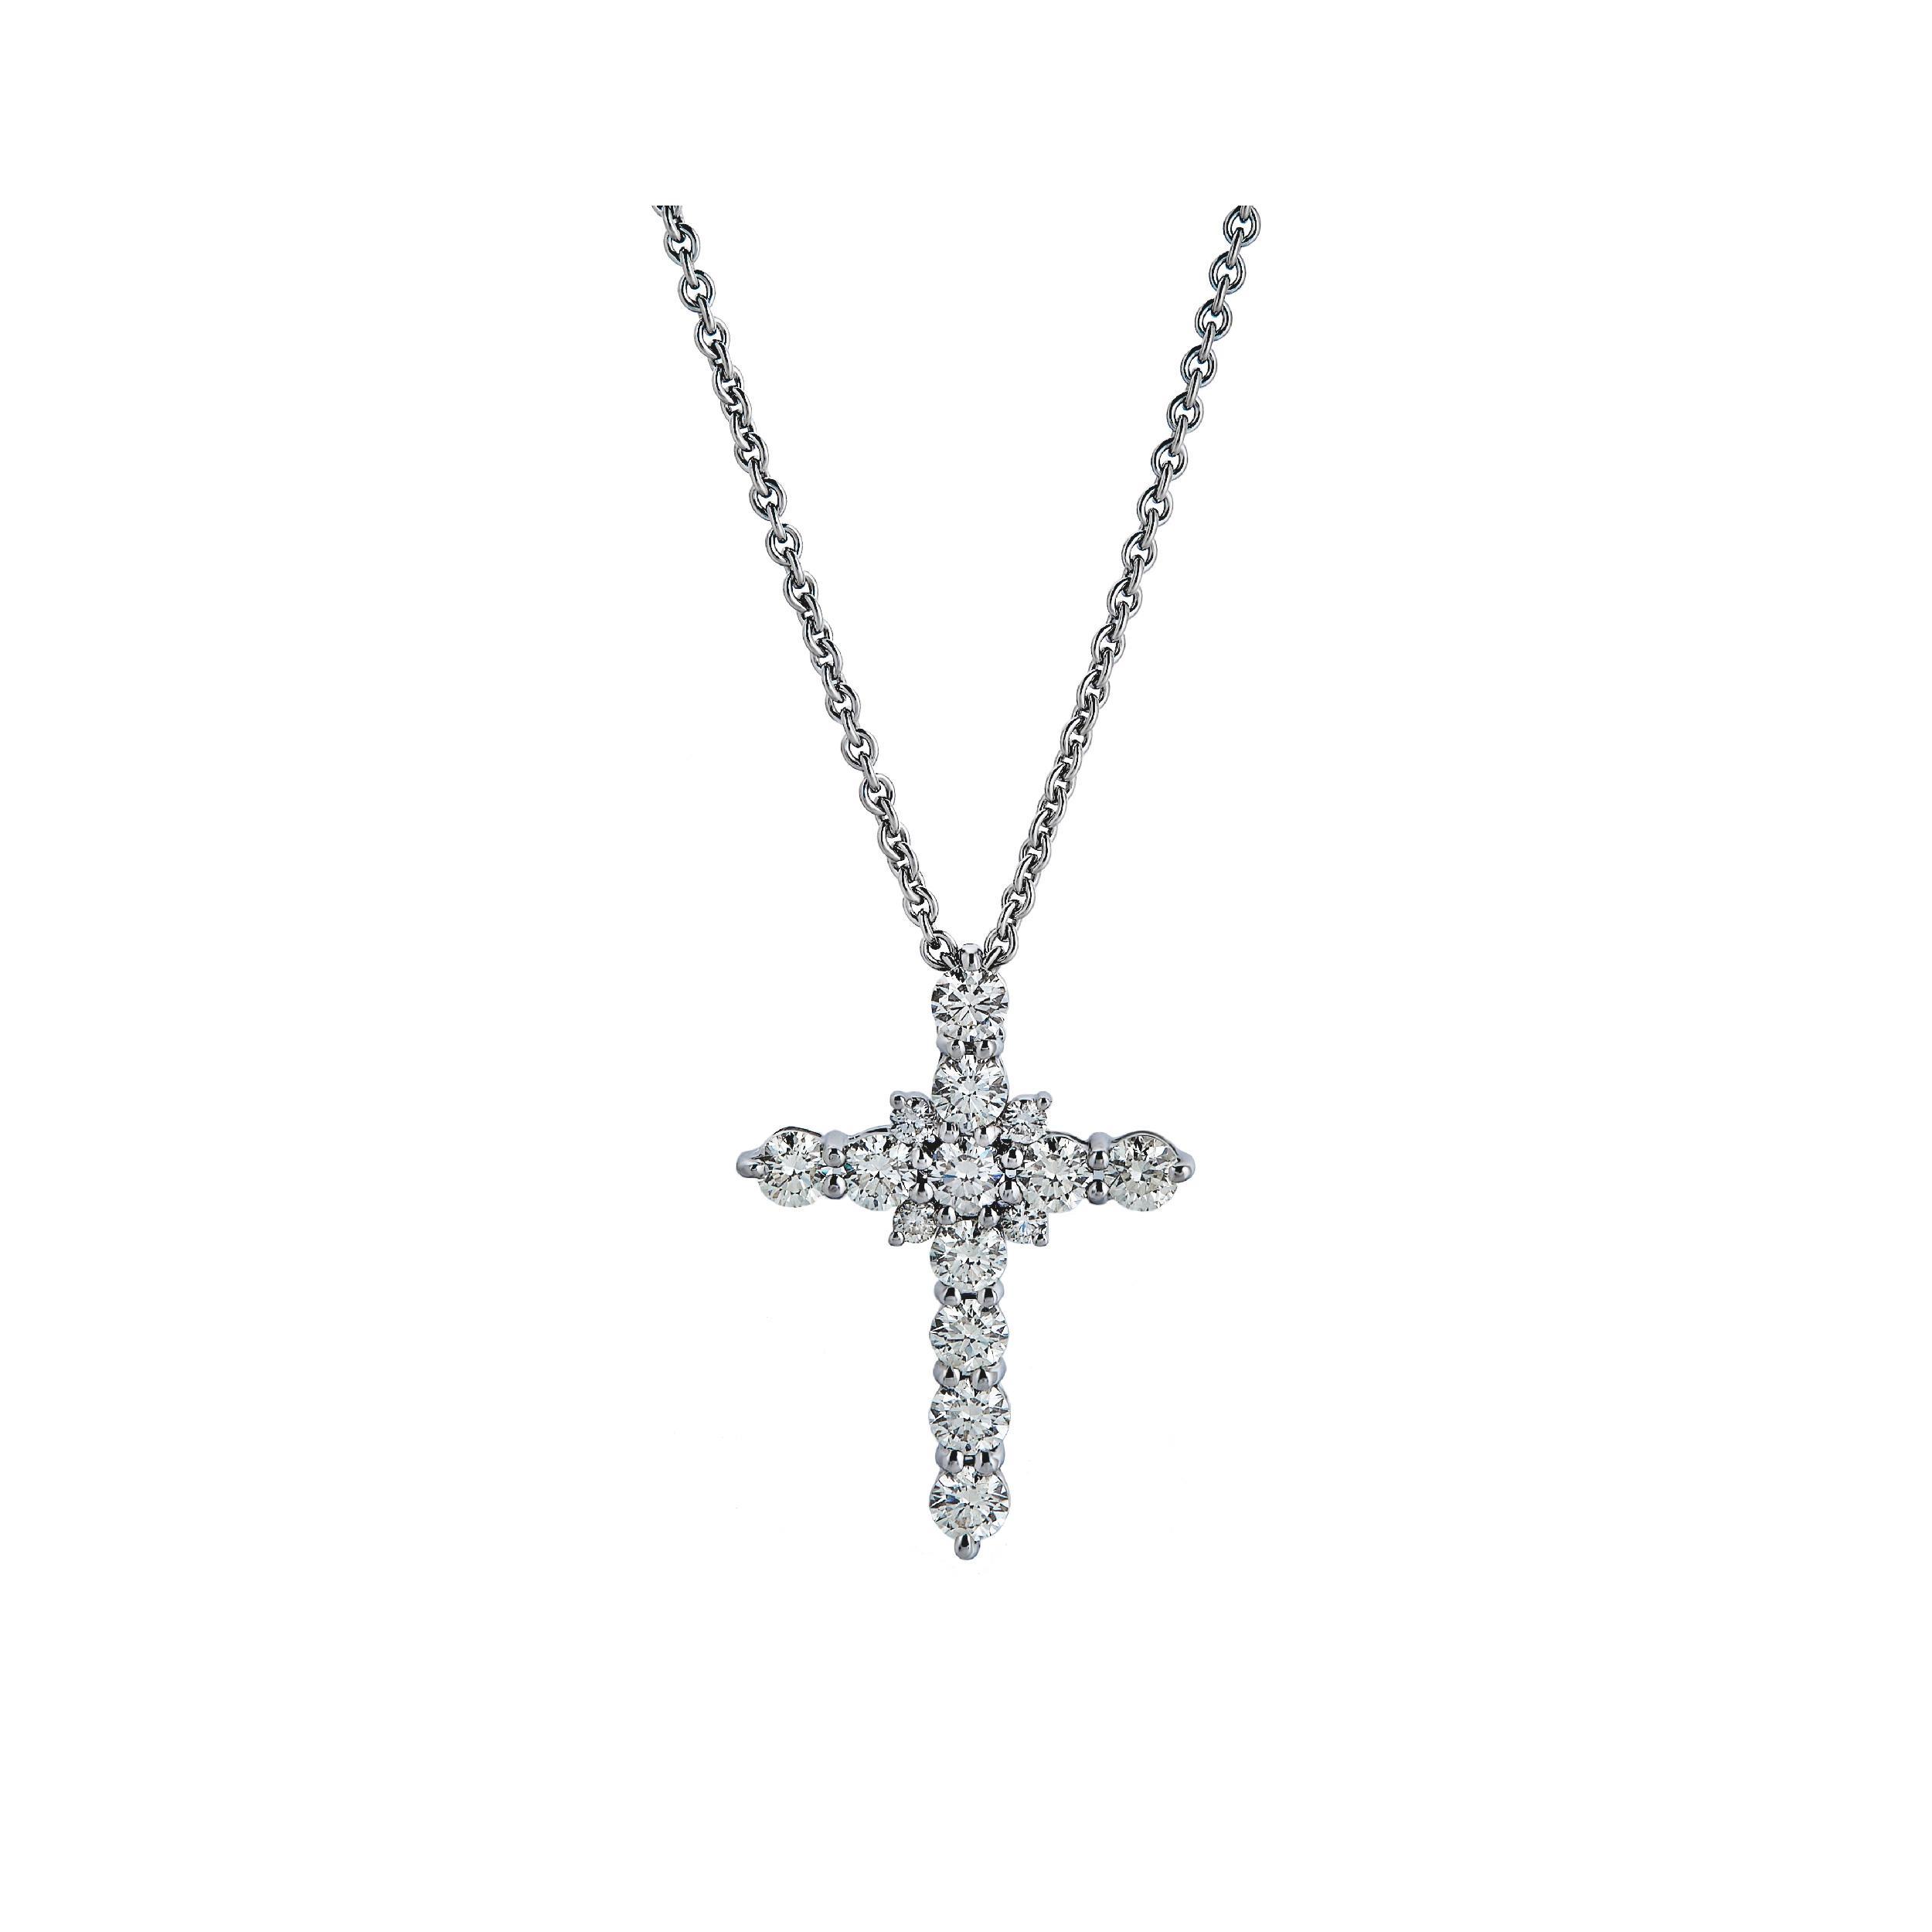 CHATE Крестик с бриллиантами 1,86 ct